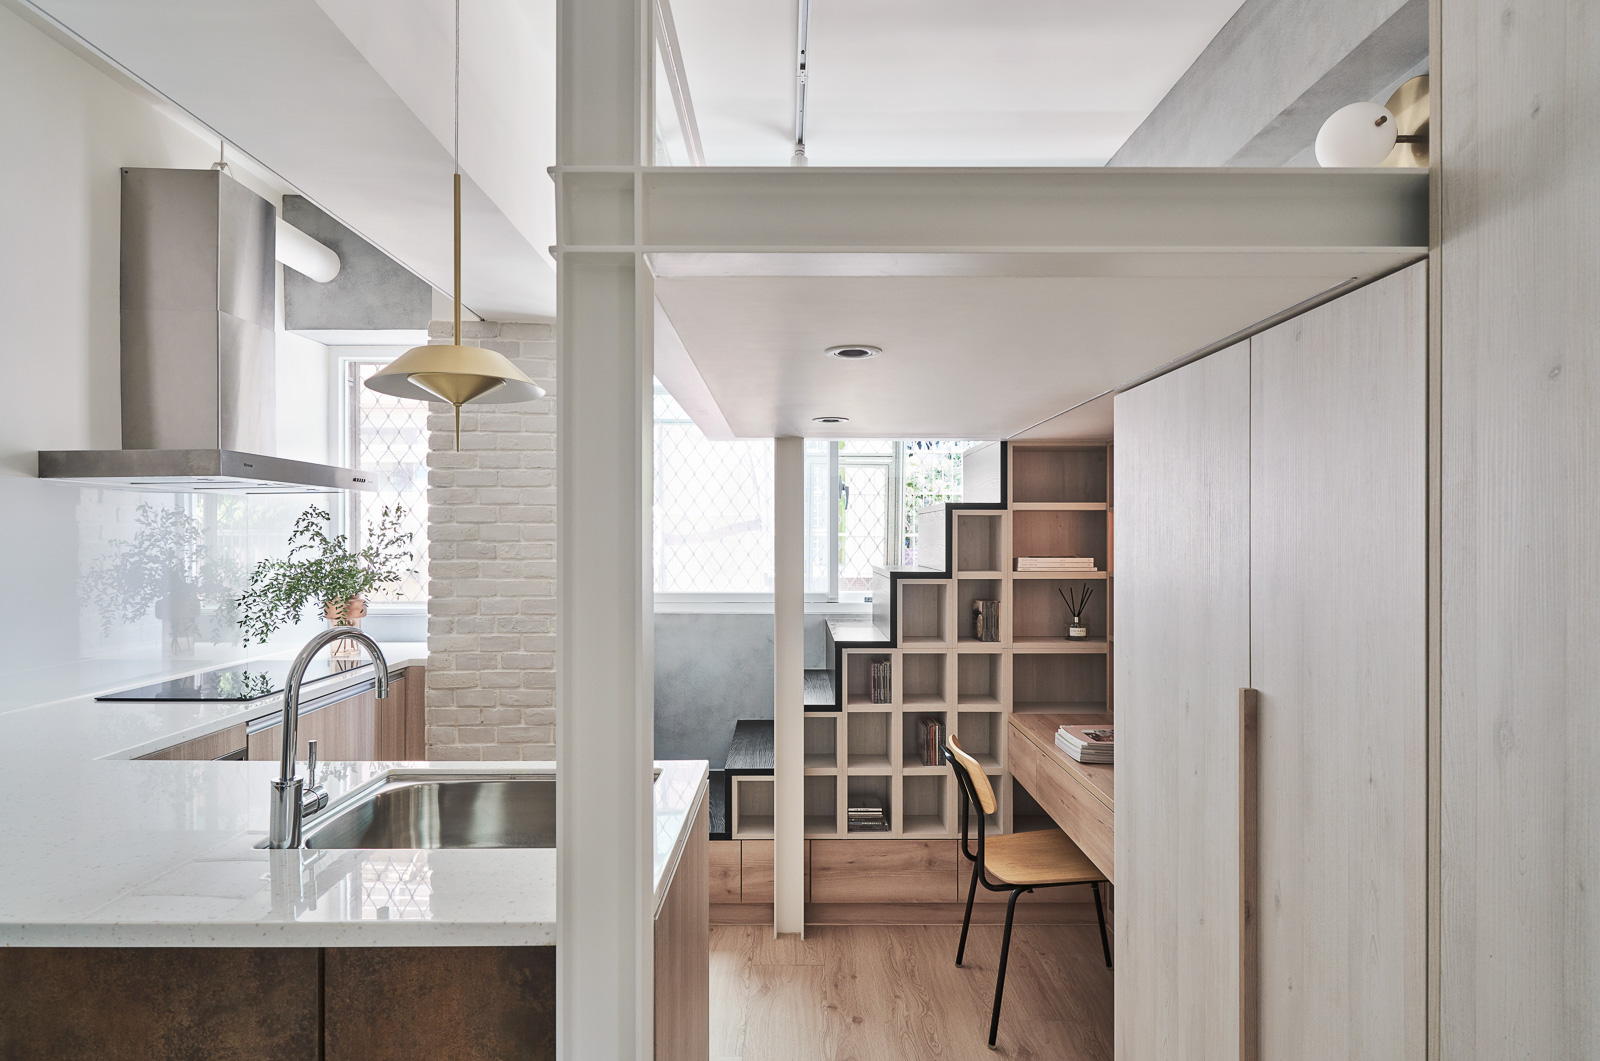 NestSpace_SmallHouse_S-184